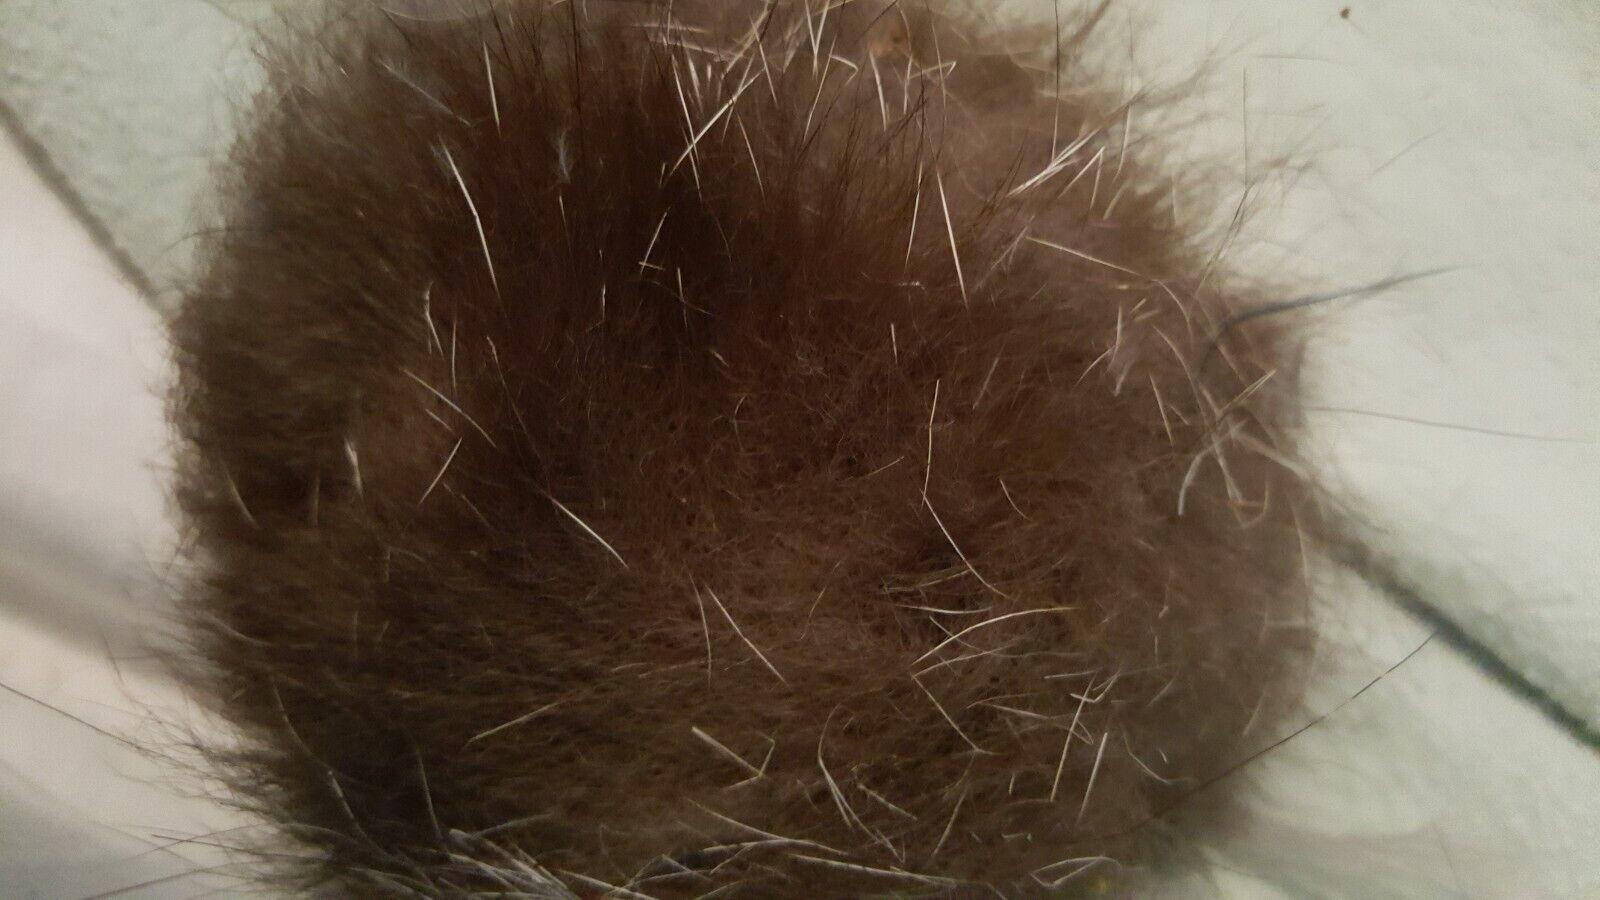 VTG/ANTIQ MILLINERY HAT SPRAY PLUMES HAIR PIECE M… - image 6